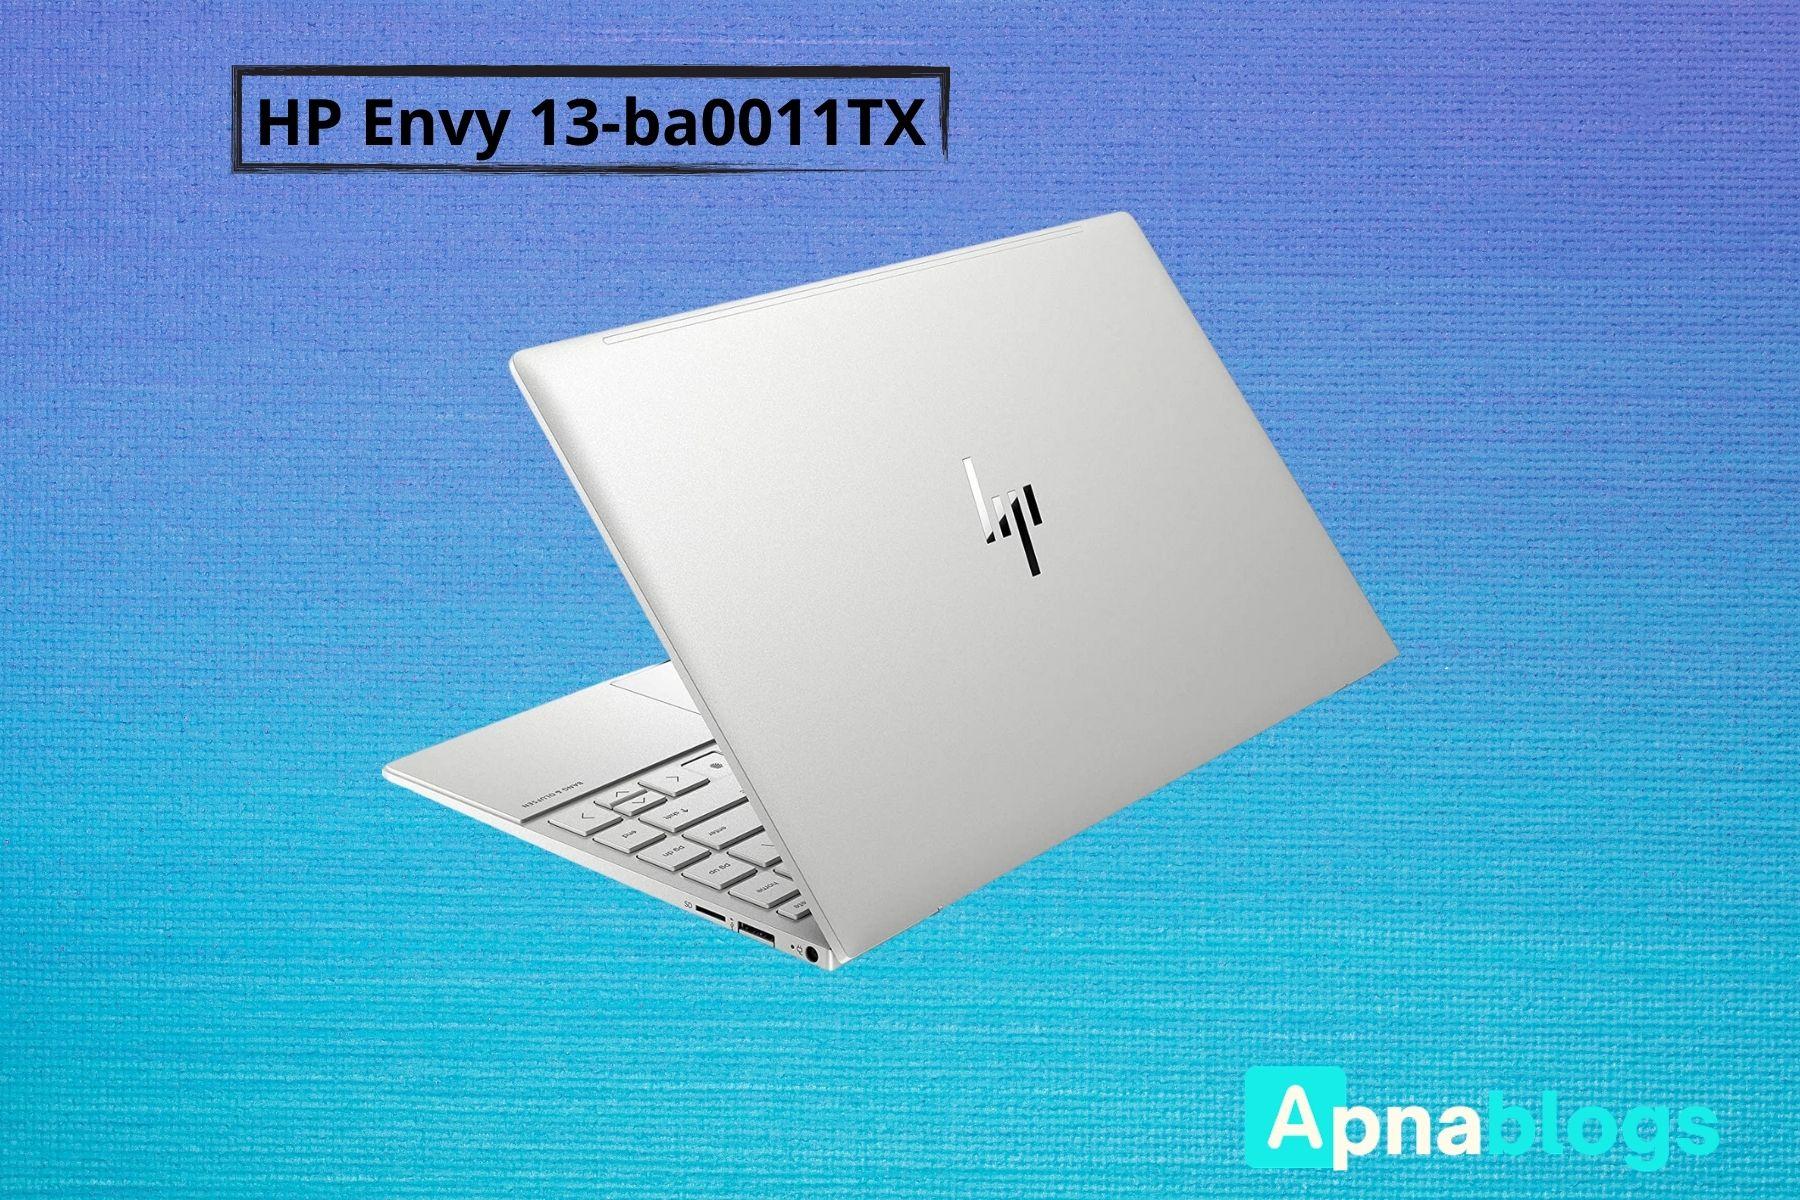 HP Envy 13-ba0011TX